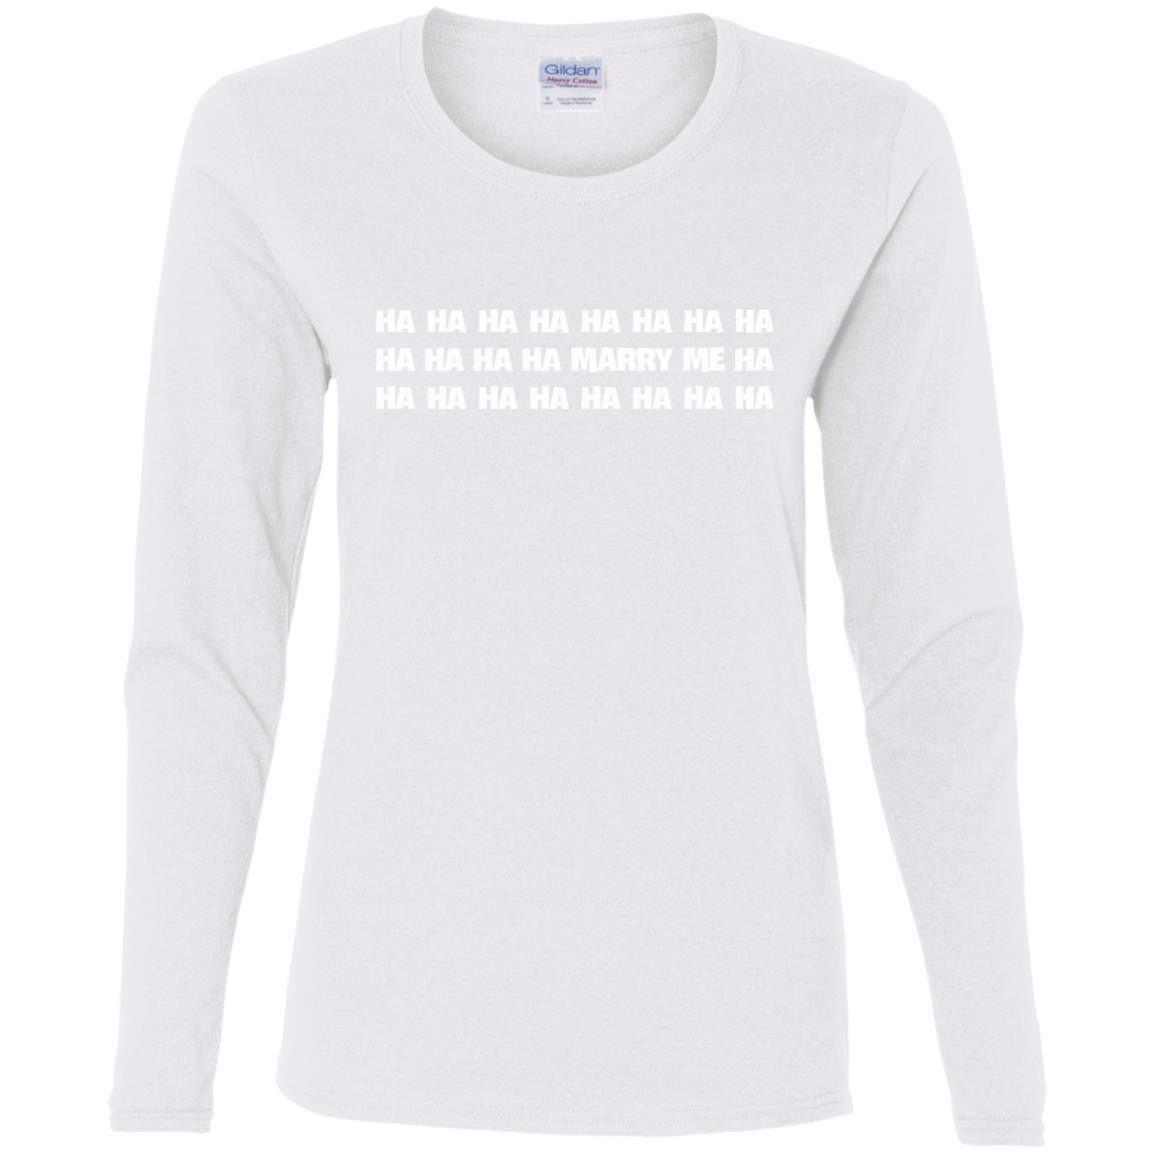 marry me t shirt hahaha t shirt lol t shirt G540L Gildan Ladies' Cotton LS T-Shirt